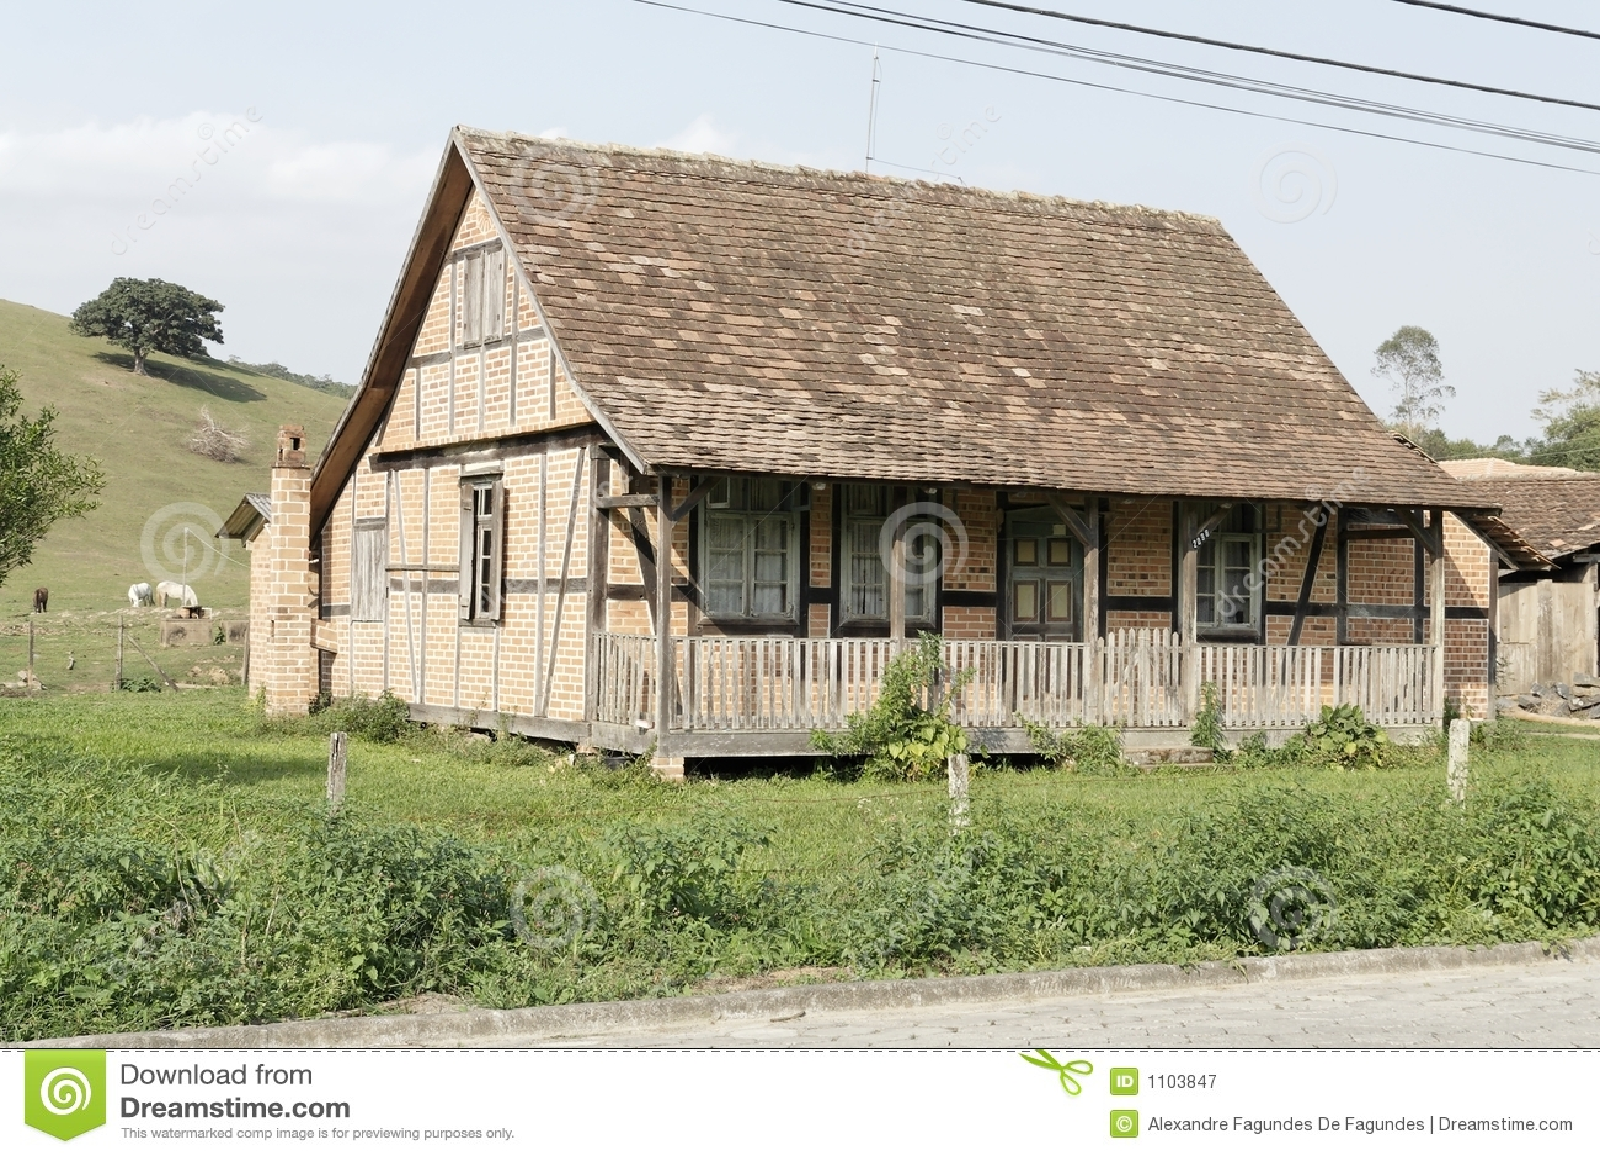 typical german half timbered historical house stock image image 1103847. Black Bedroom Furniture Sets. Home Design Ideas